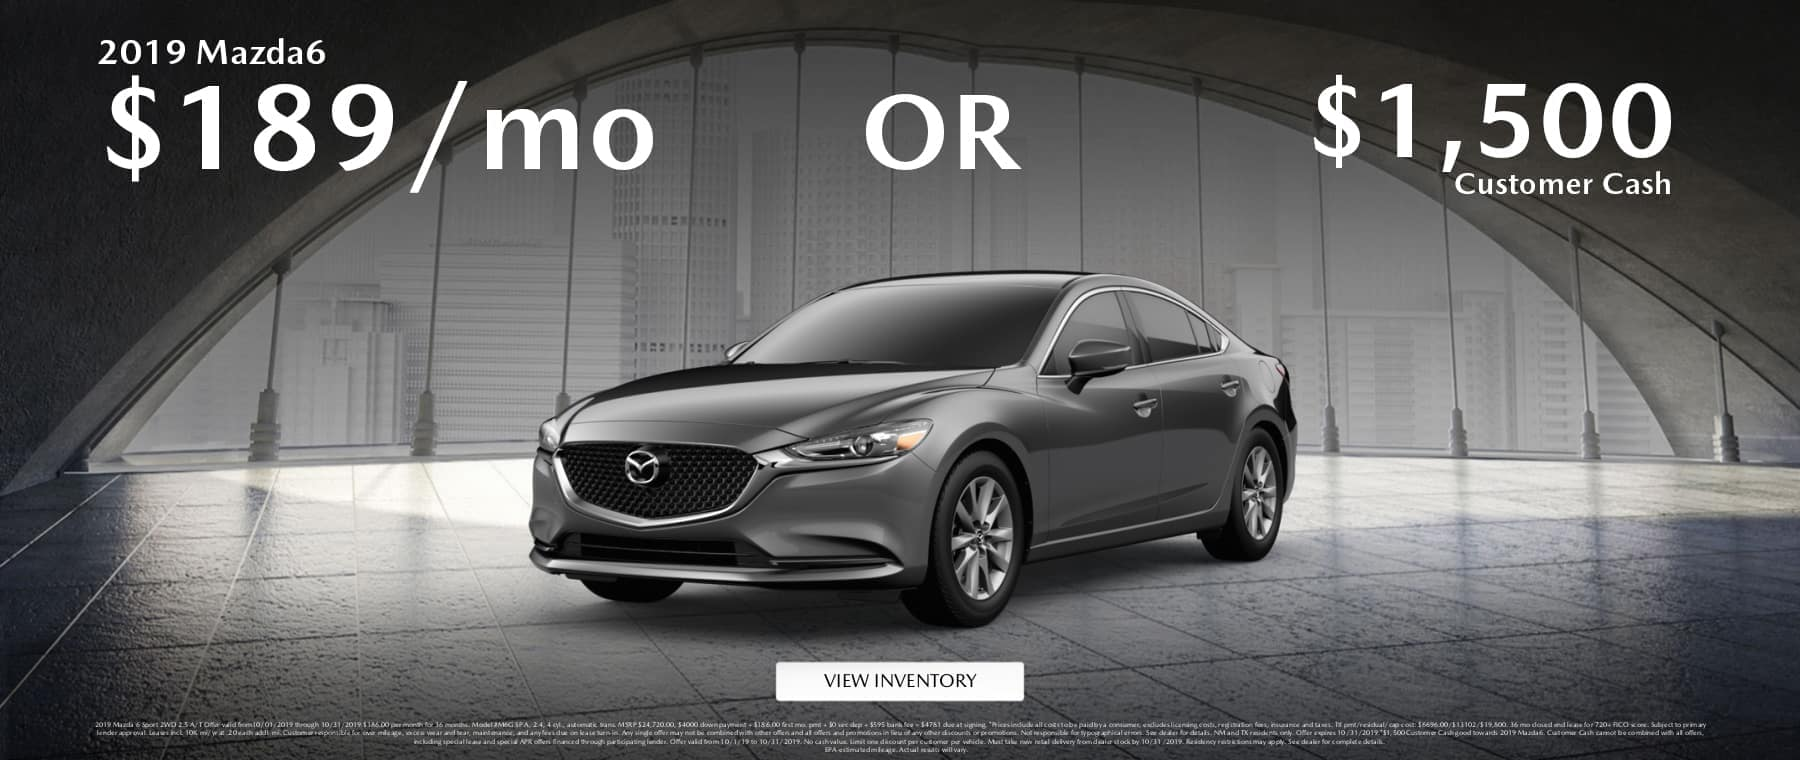 Mazda6 Lease Offer